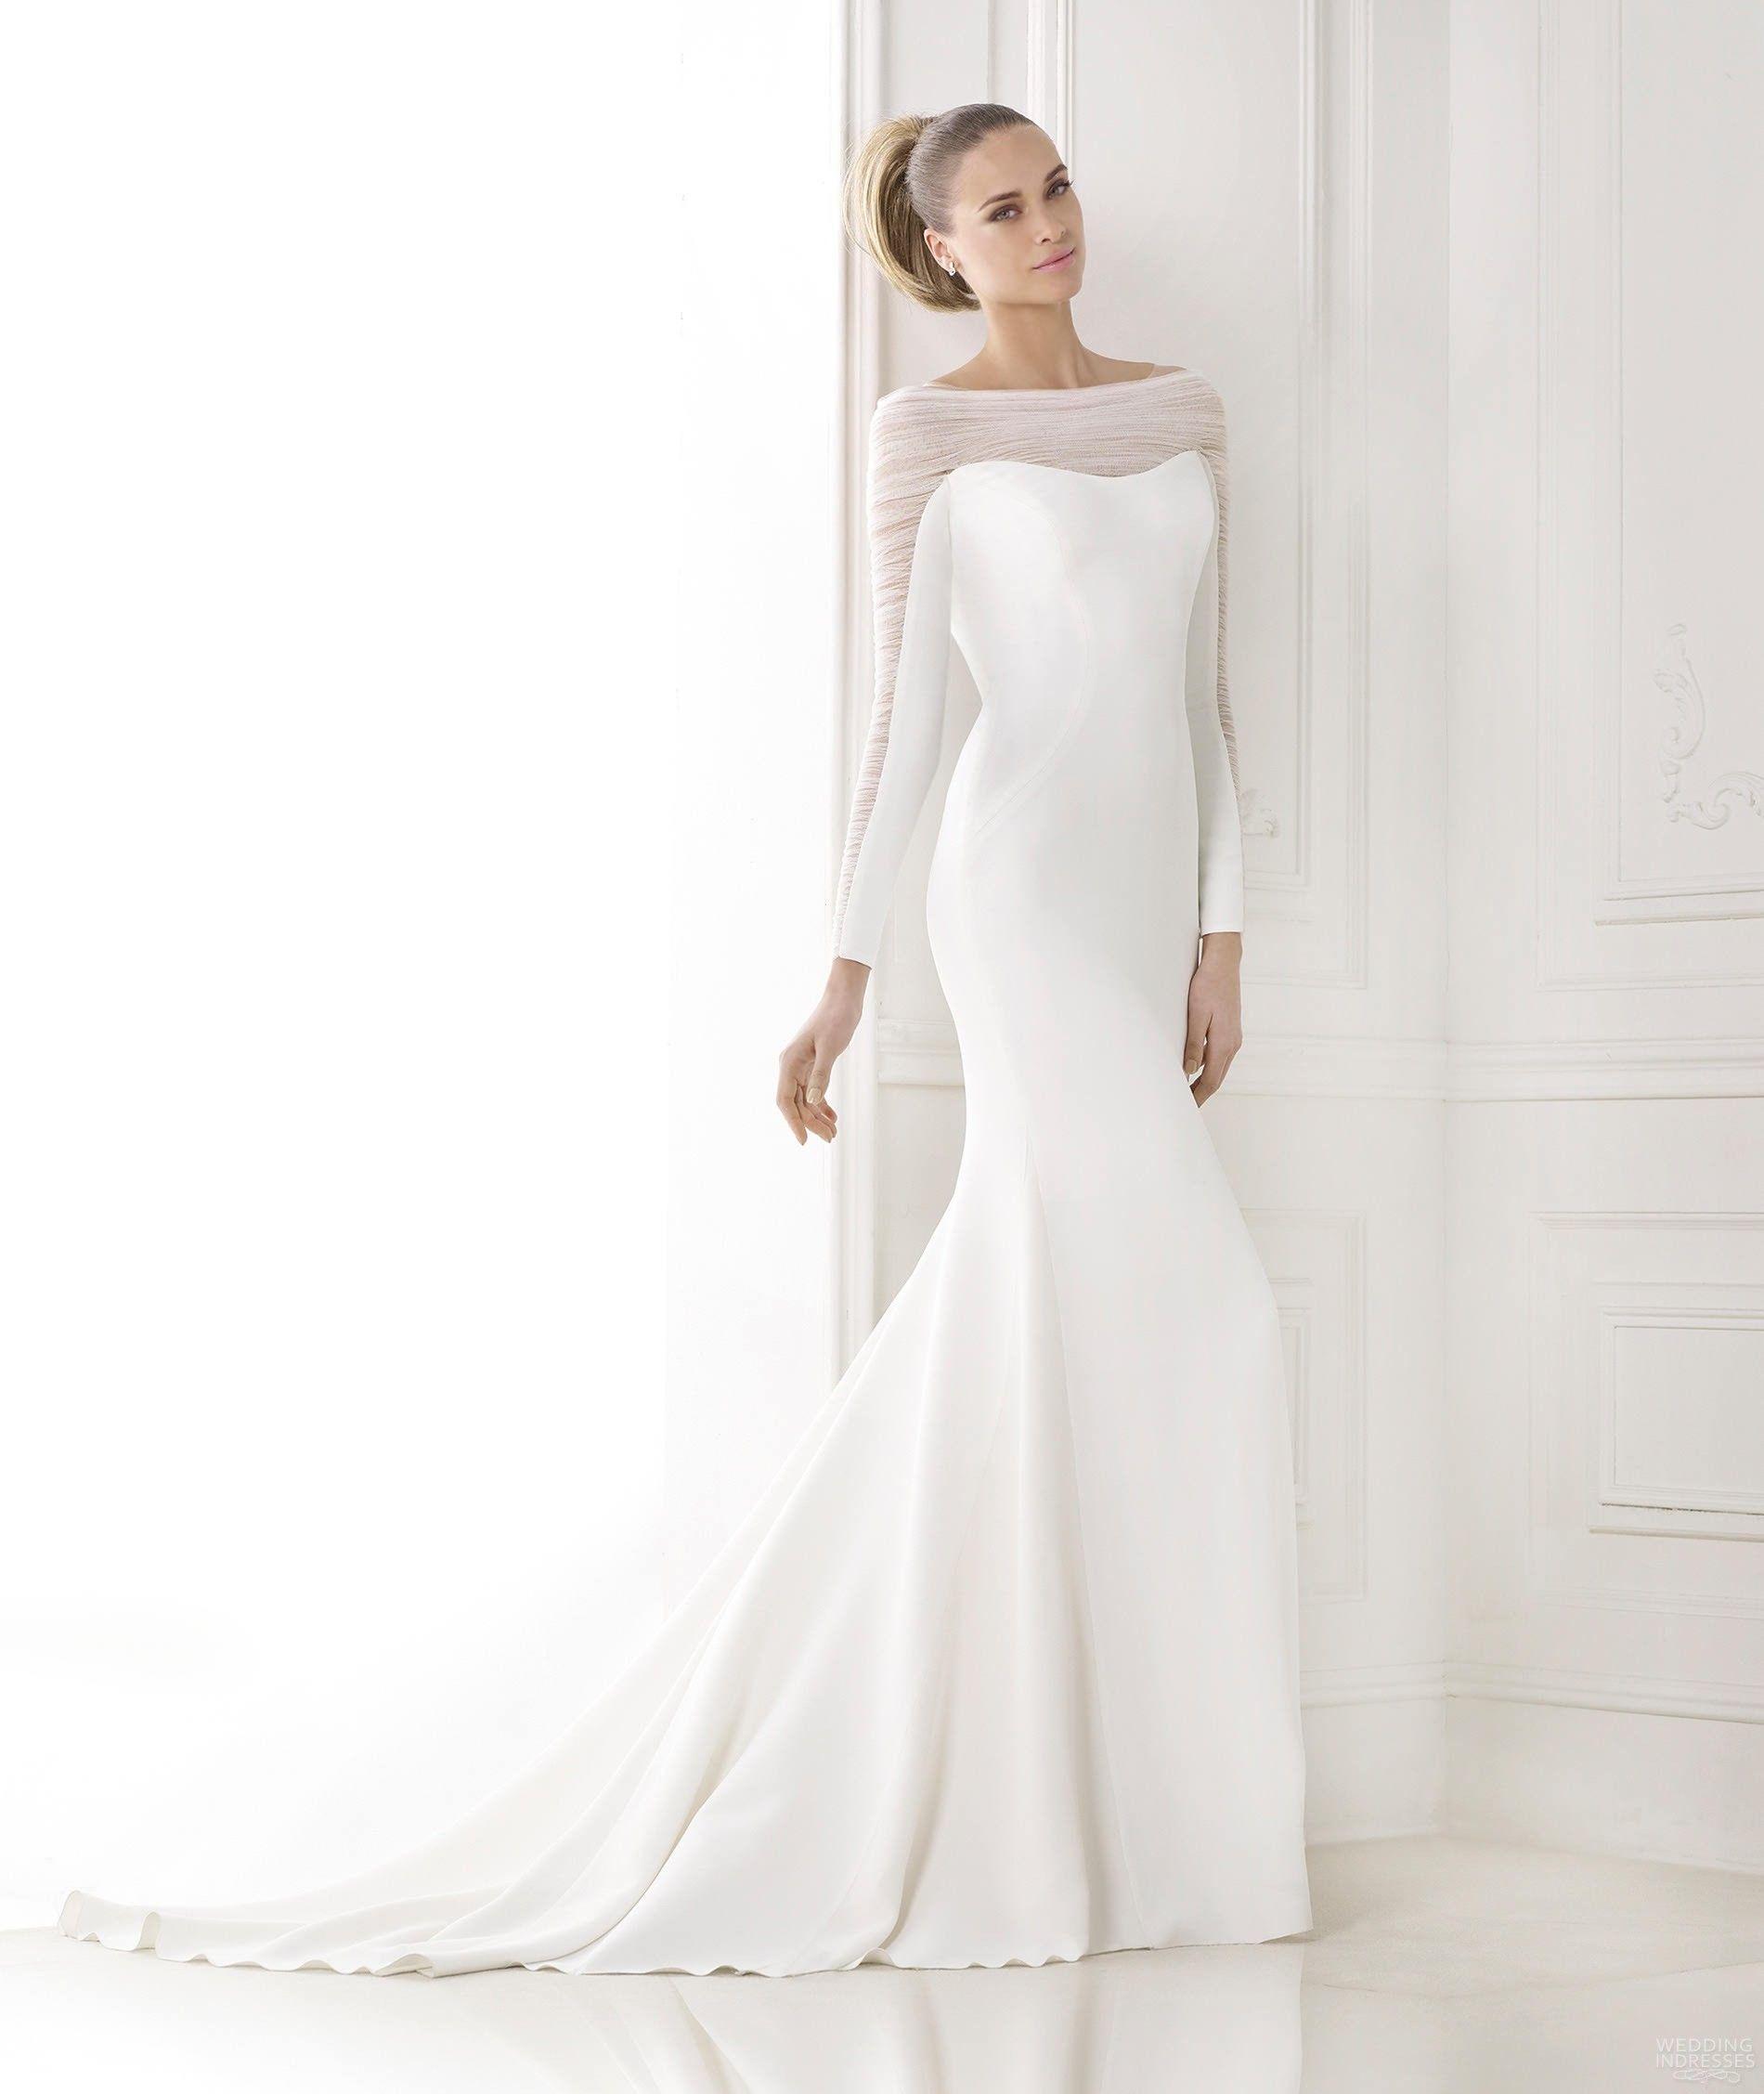 straight wedding dresses Long Sleeve Wedding Dresses Los Angeles and long sleeve wedding dresses birmingham Straight